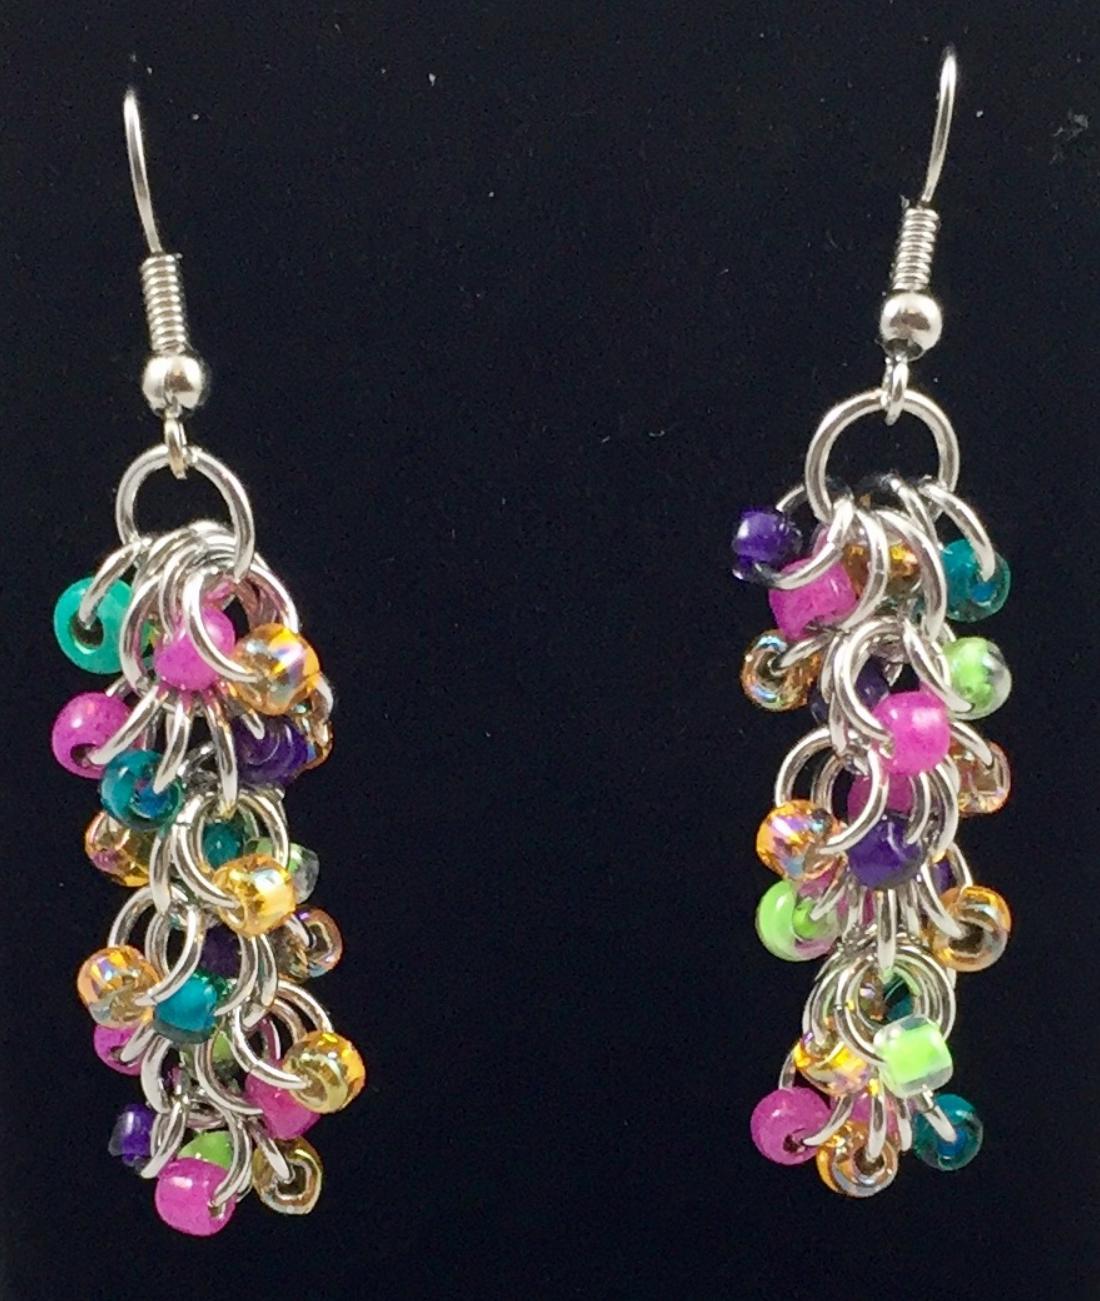 Loops of crystal seed beads on silver rings